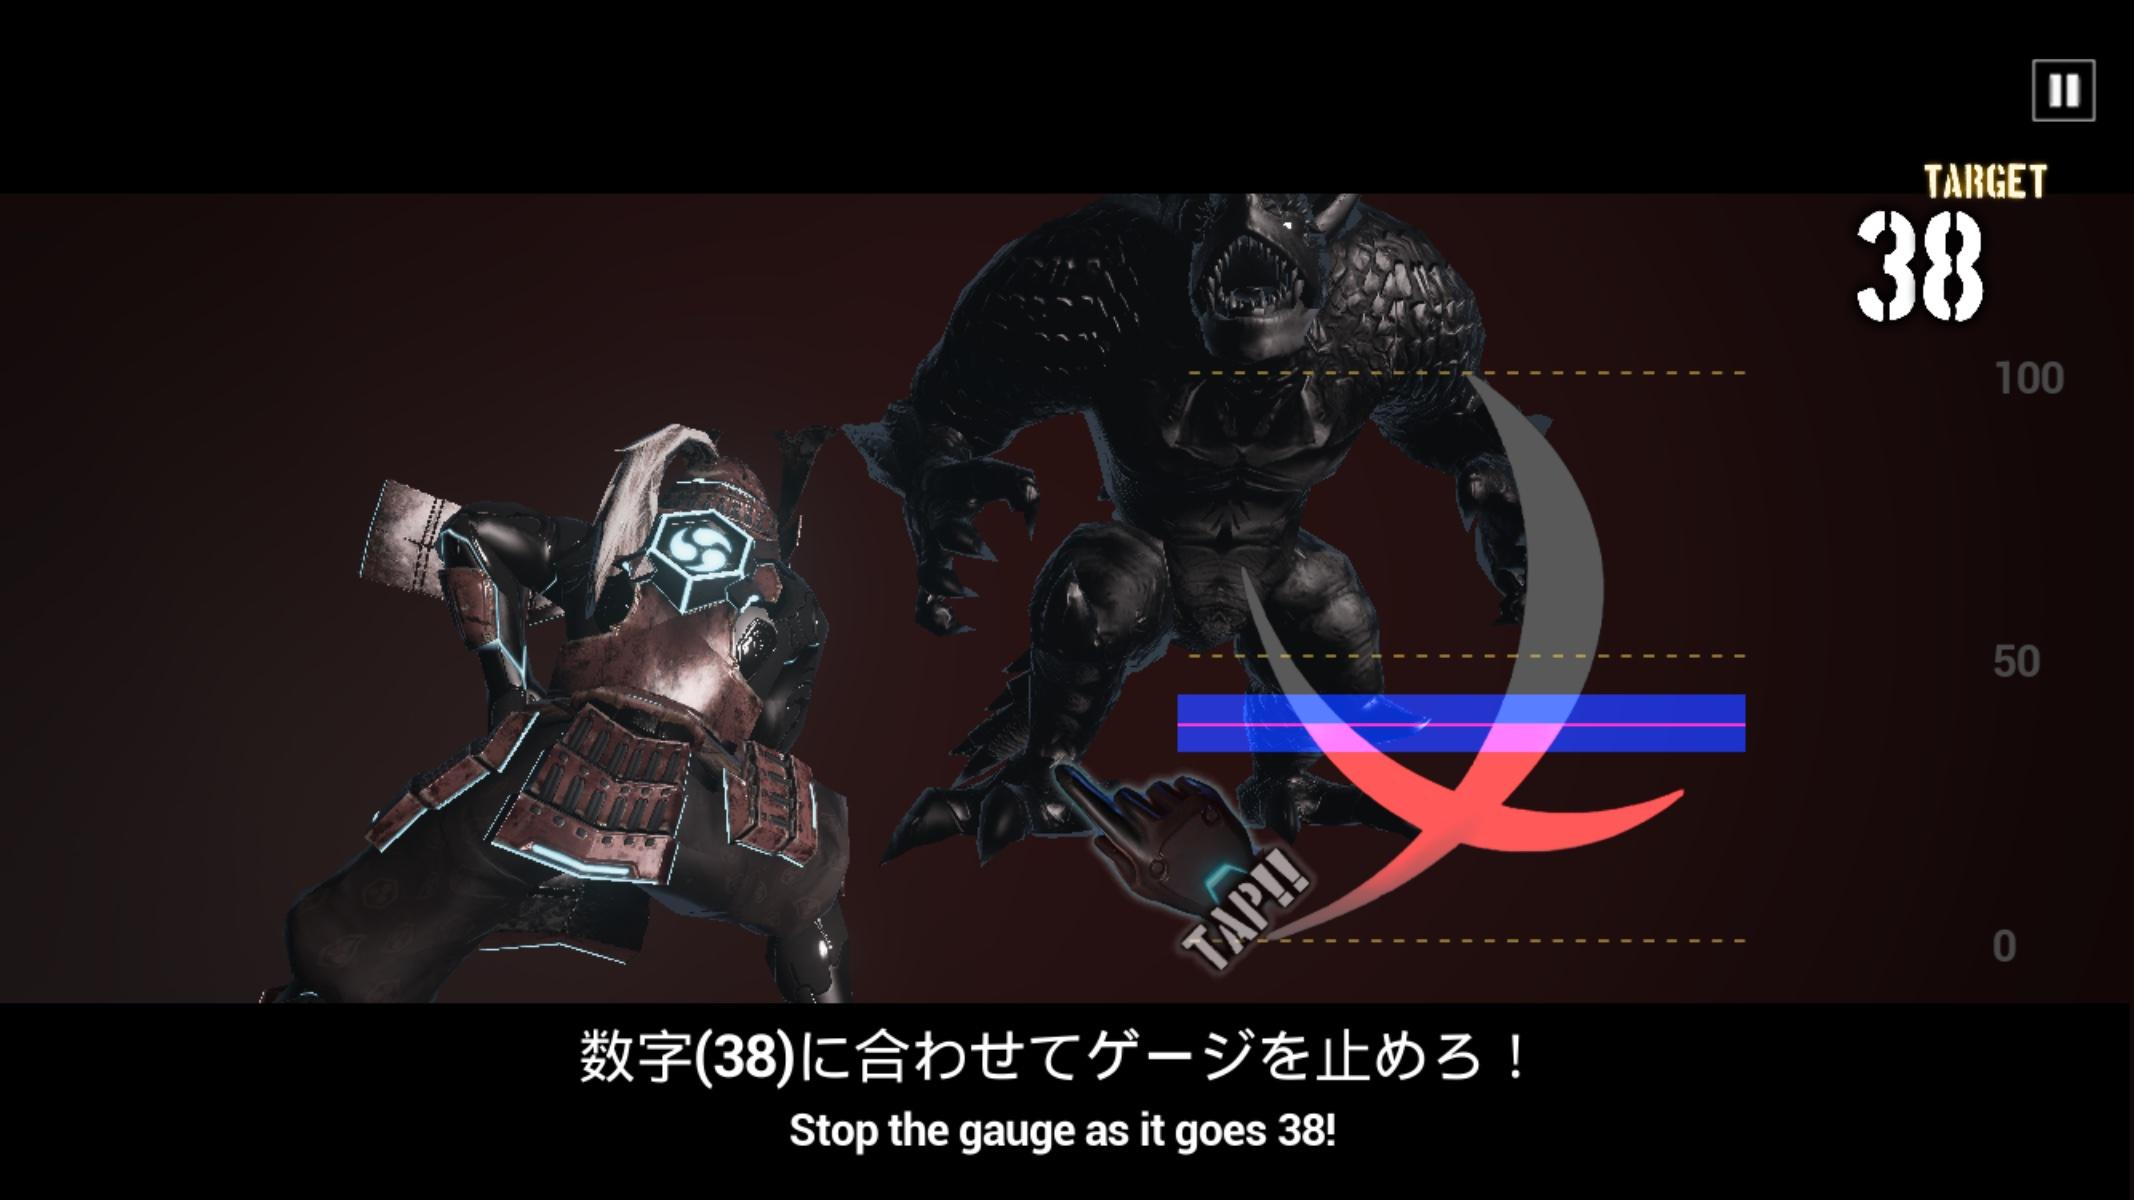 androidアプリ ATTACK ON KAIJU 2 - 進撃の巨獣2攻略スクリーンショット2